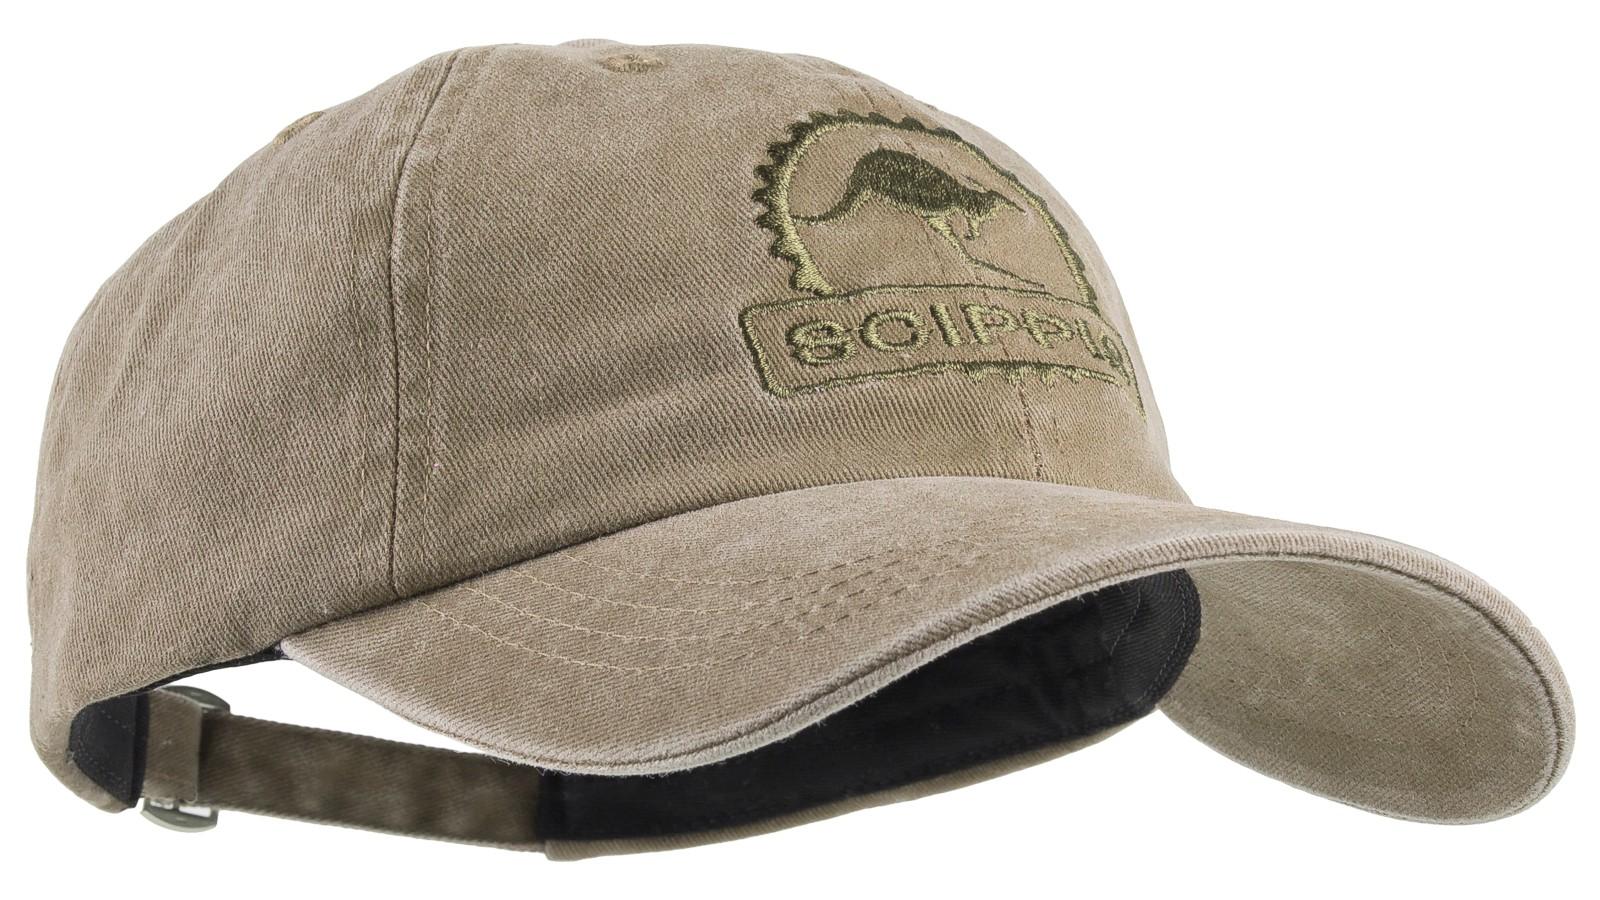 Scippis Baseball-Cap »Scippis Känguru« Khaki